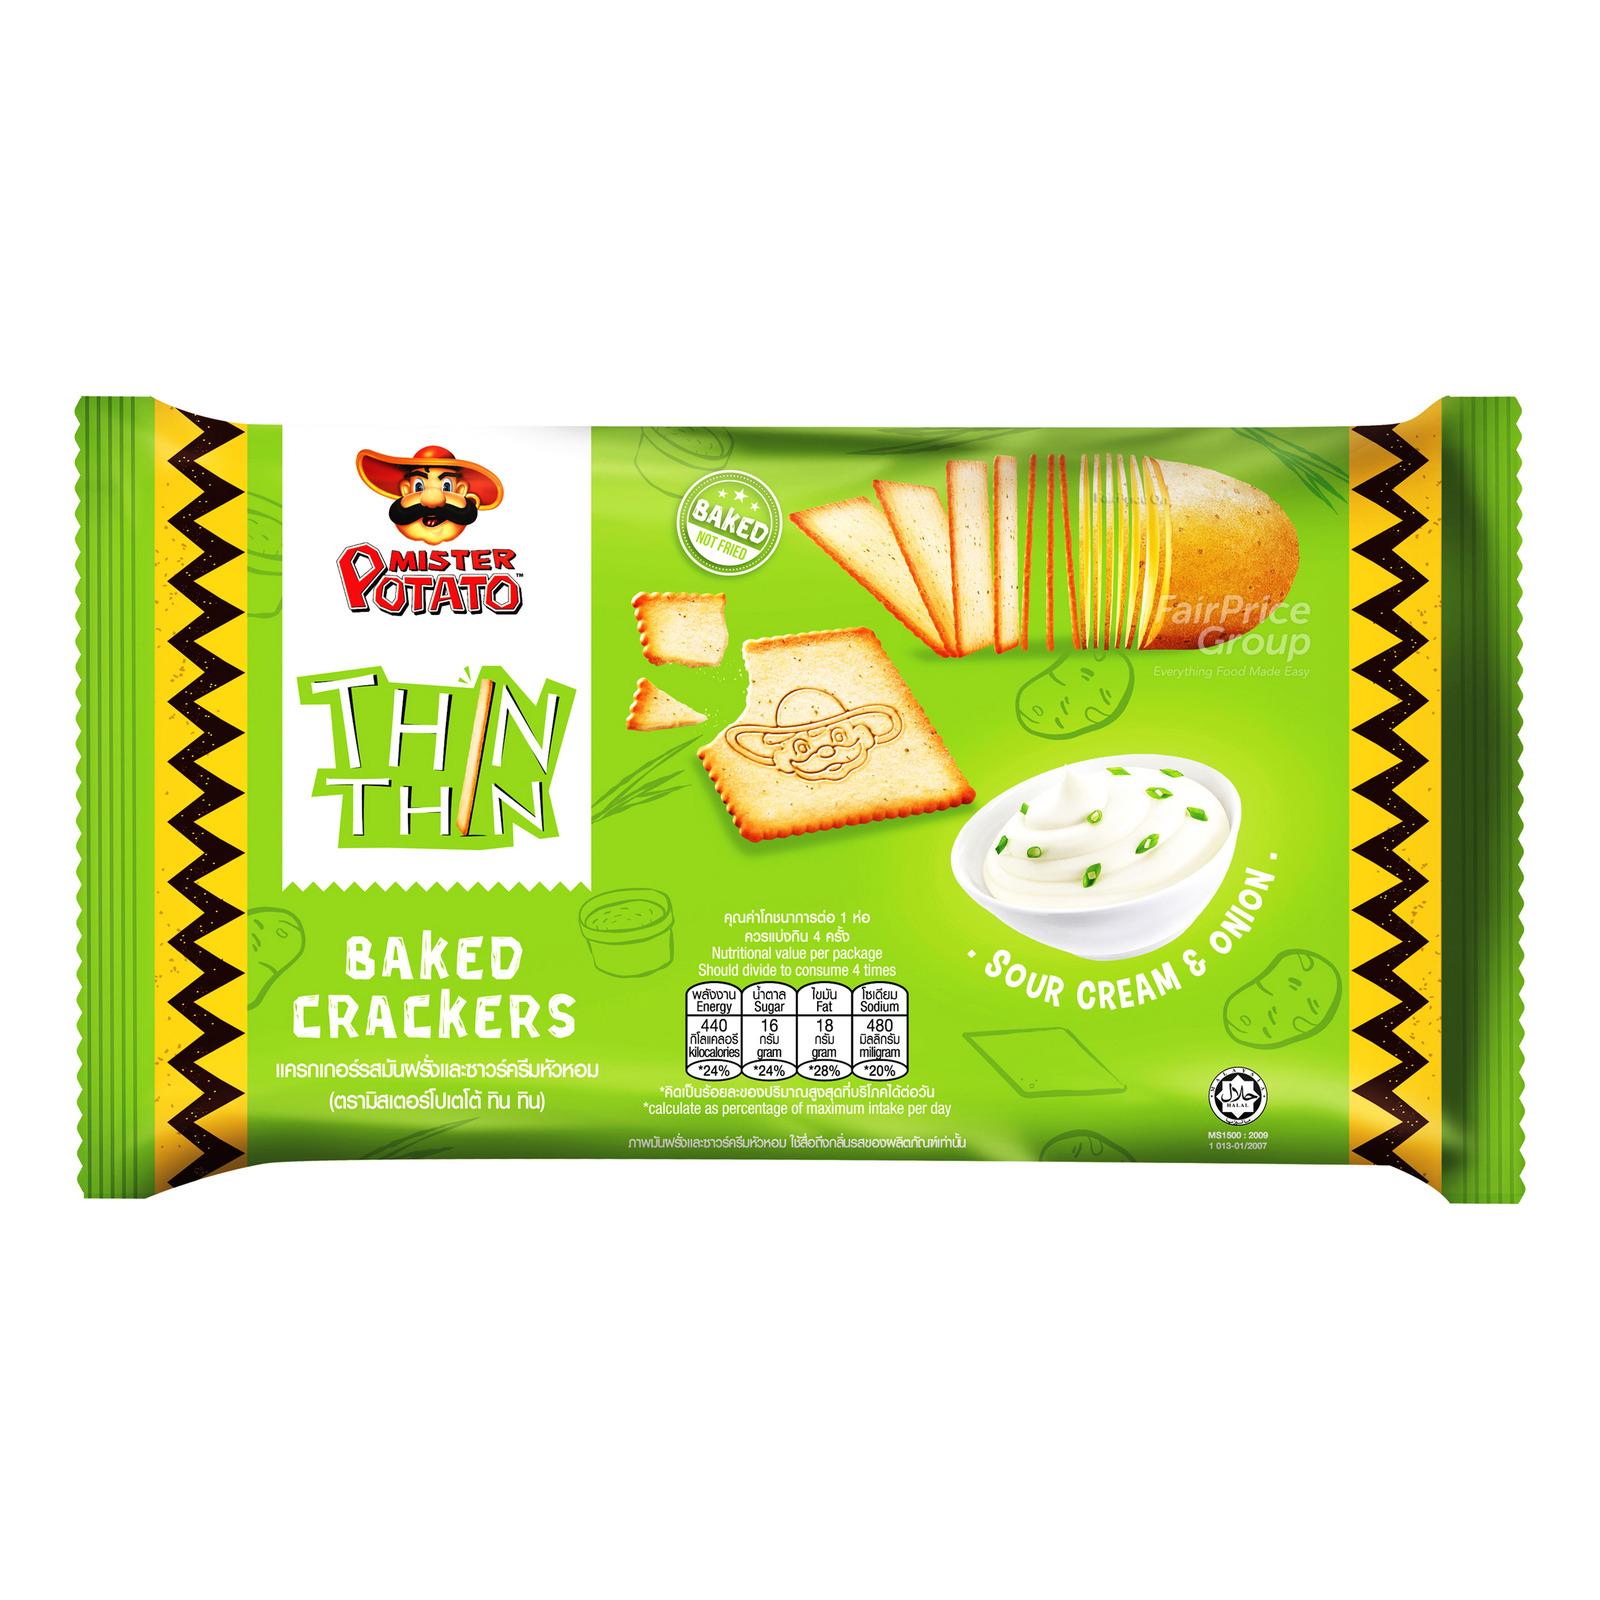 Mister Potato Thin Thin Baked Crackers - Sour Cream & Onion